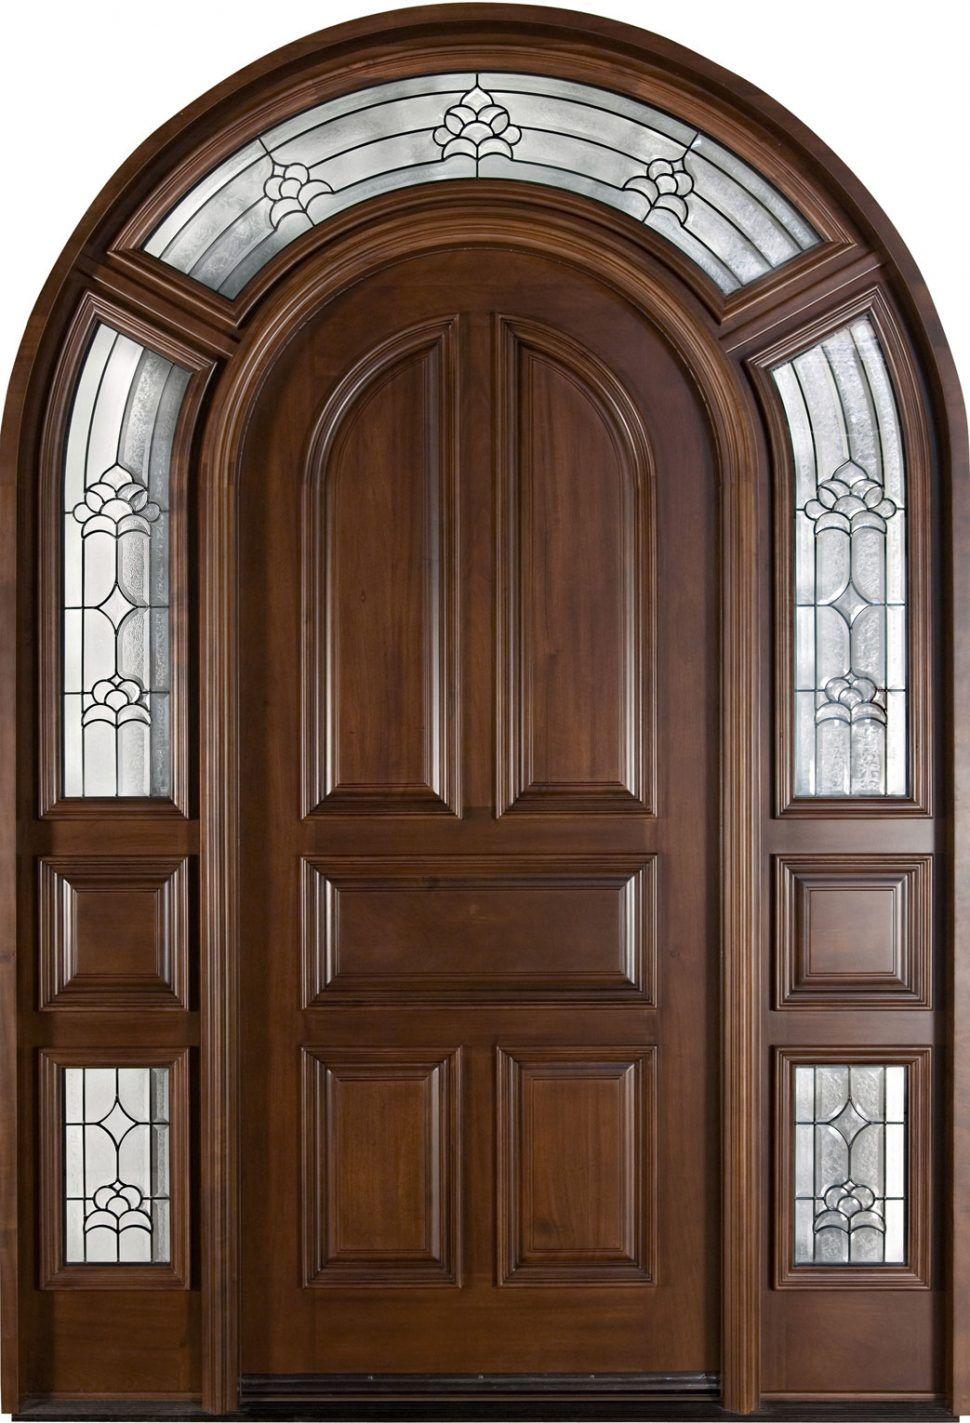 Furniture Fancy Mahogany Dark Arch Front Door Idea Inspiring Big Front Door Ideas For Your Front Entry Traditional Front Doors Wood Entry Doors Arched Doors